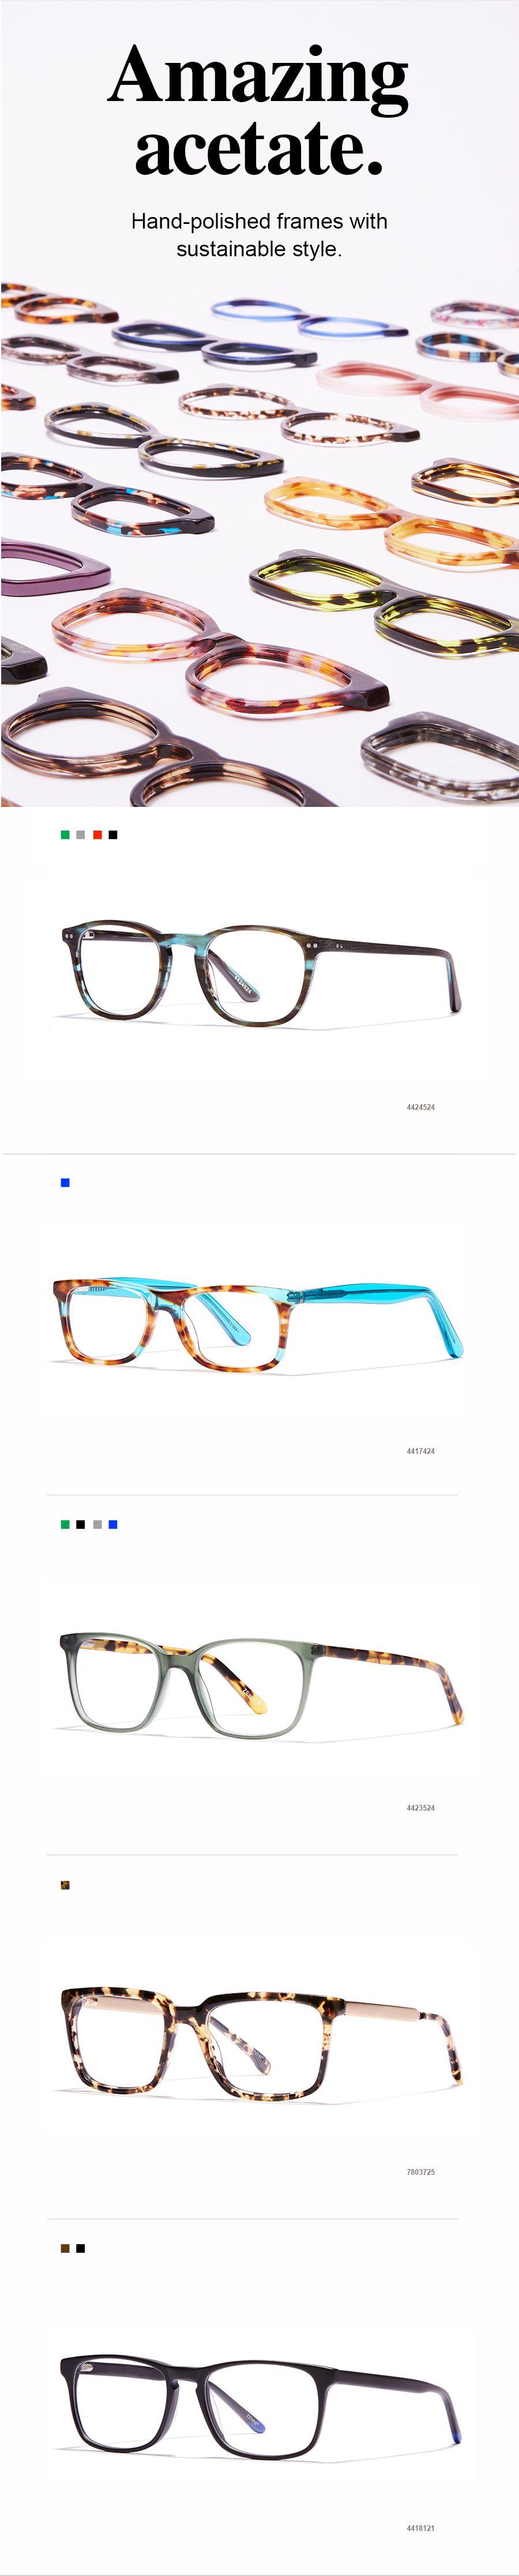 Pattern Geometric Glasses #4429839 | Zenni Optical Eyeglasses ...